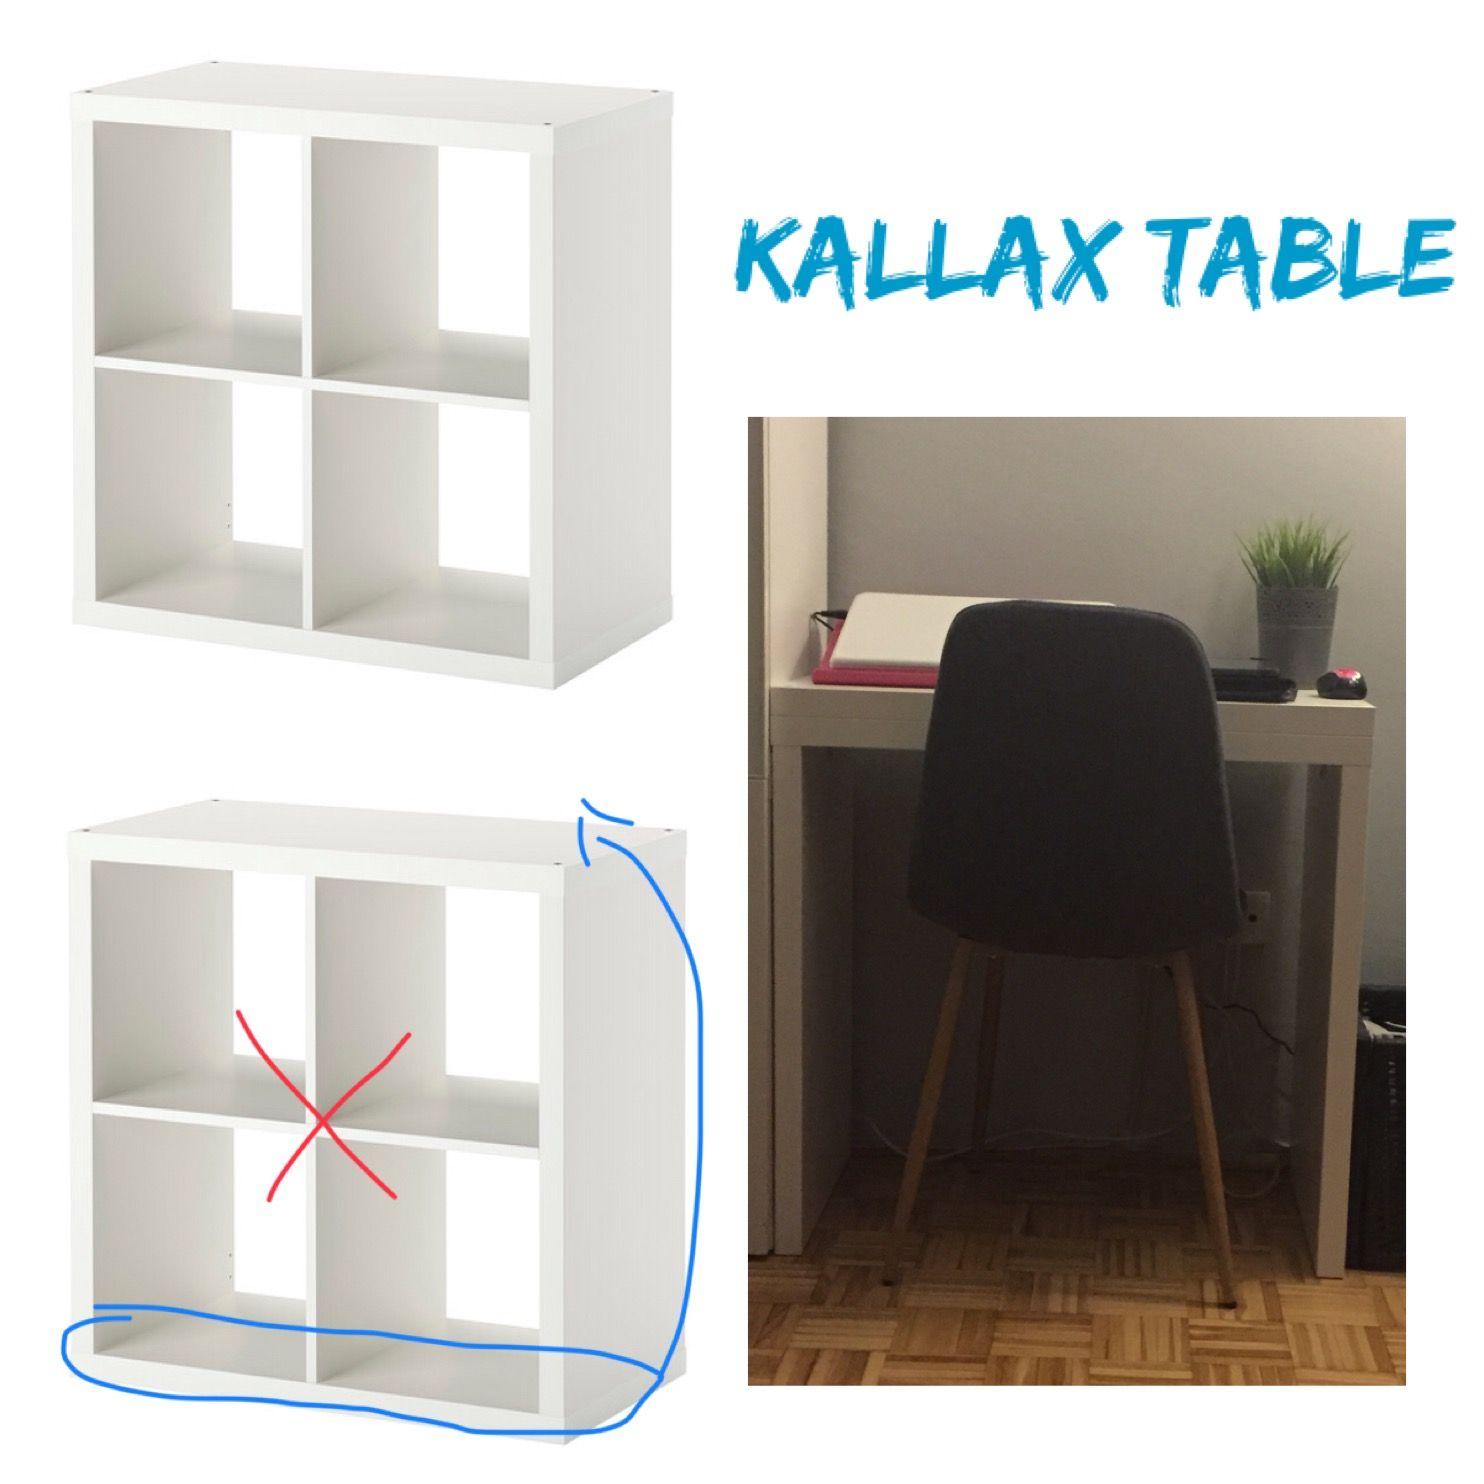 Ikea Hack Turn Kallax Bookshelf Into A Laptop Table Ikea Expedit Ikea Storage Bench